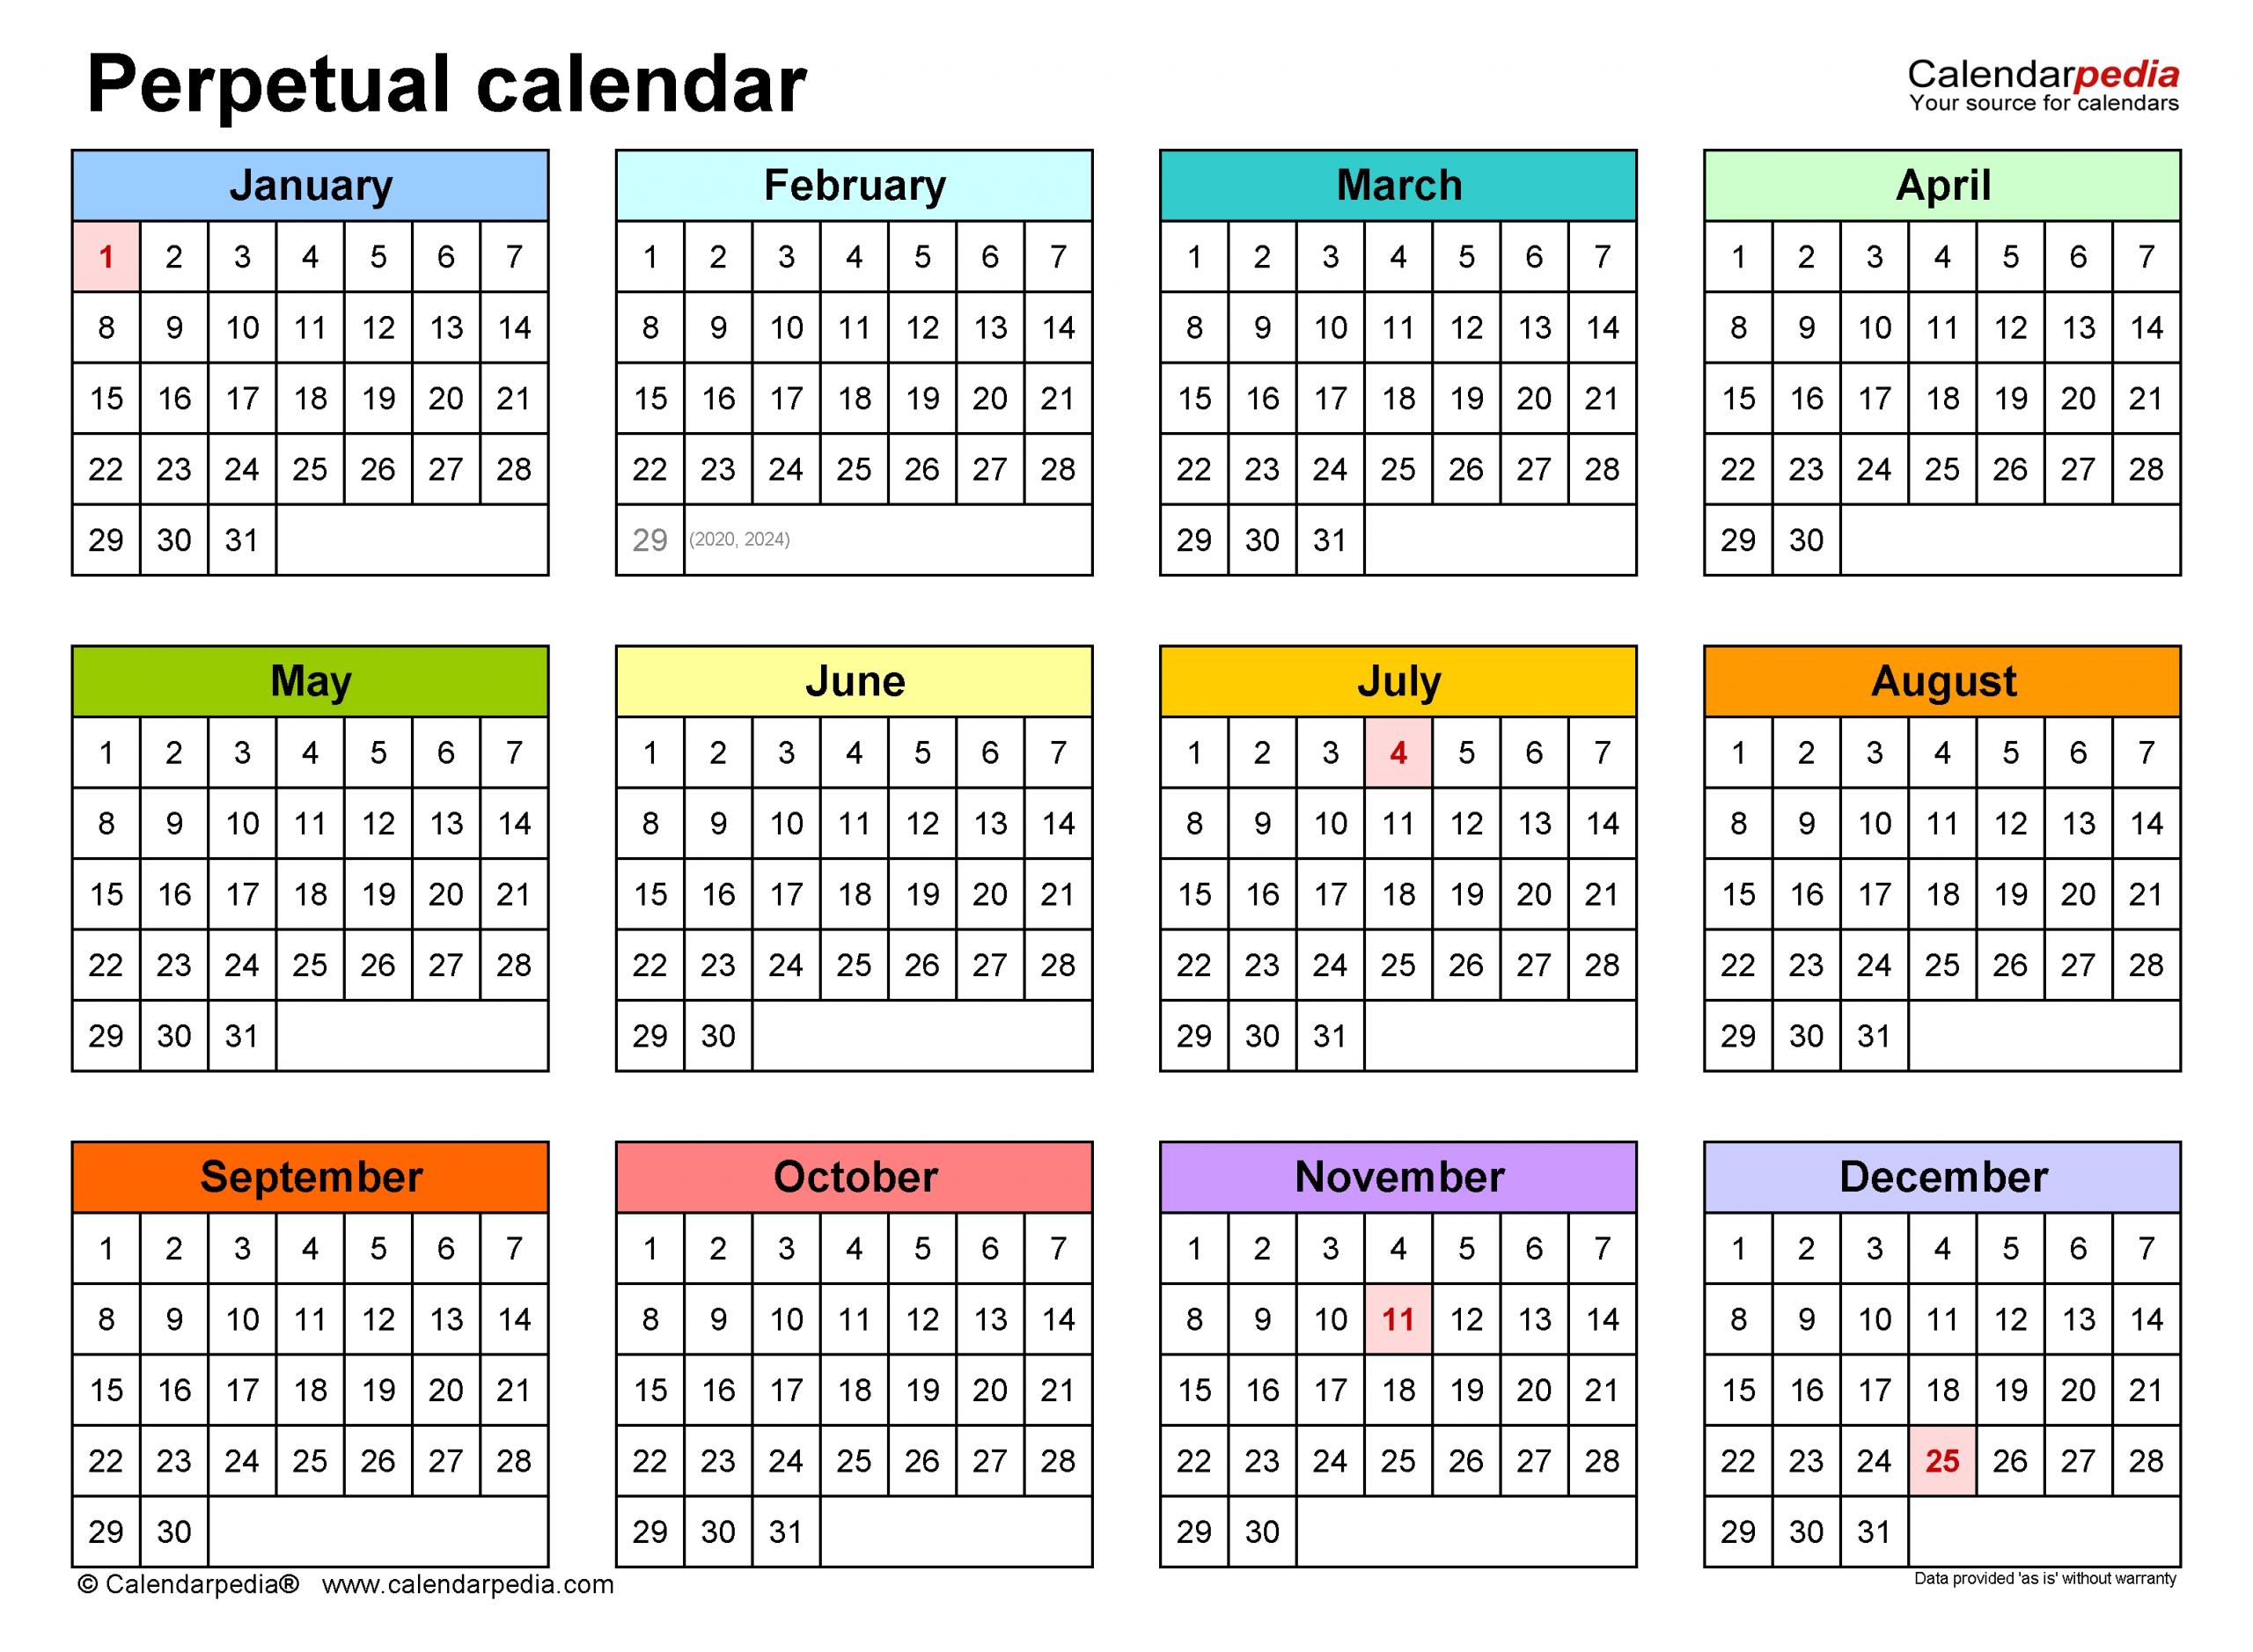 Perpetual Calendars - Free Printable Microsoft Word Templates with regard to Free Printable Perpetual Calendar Template